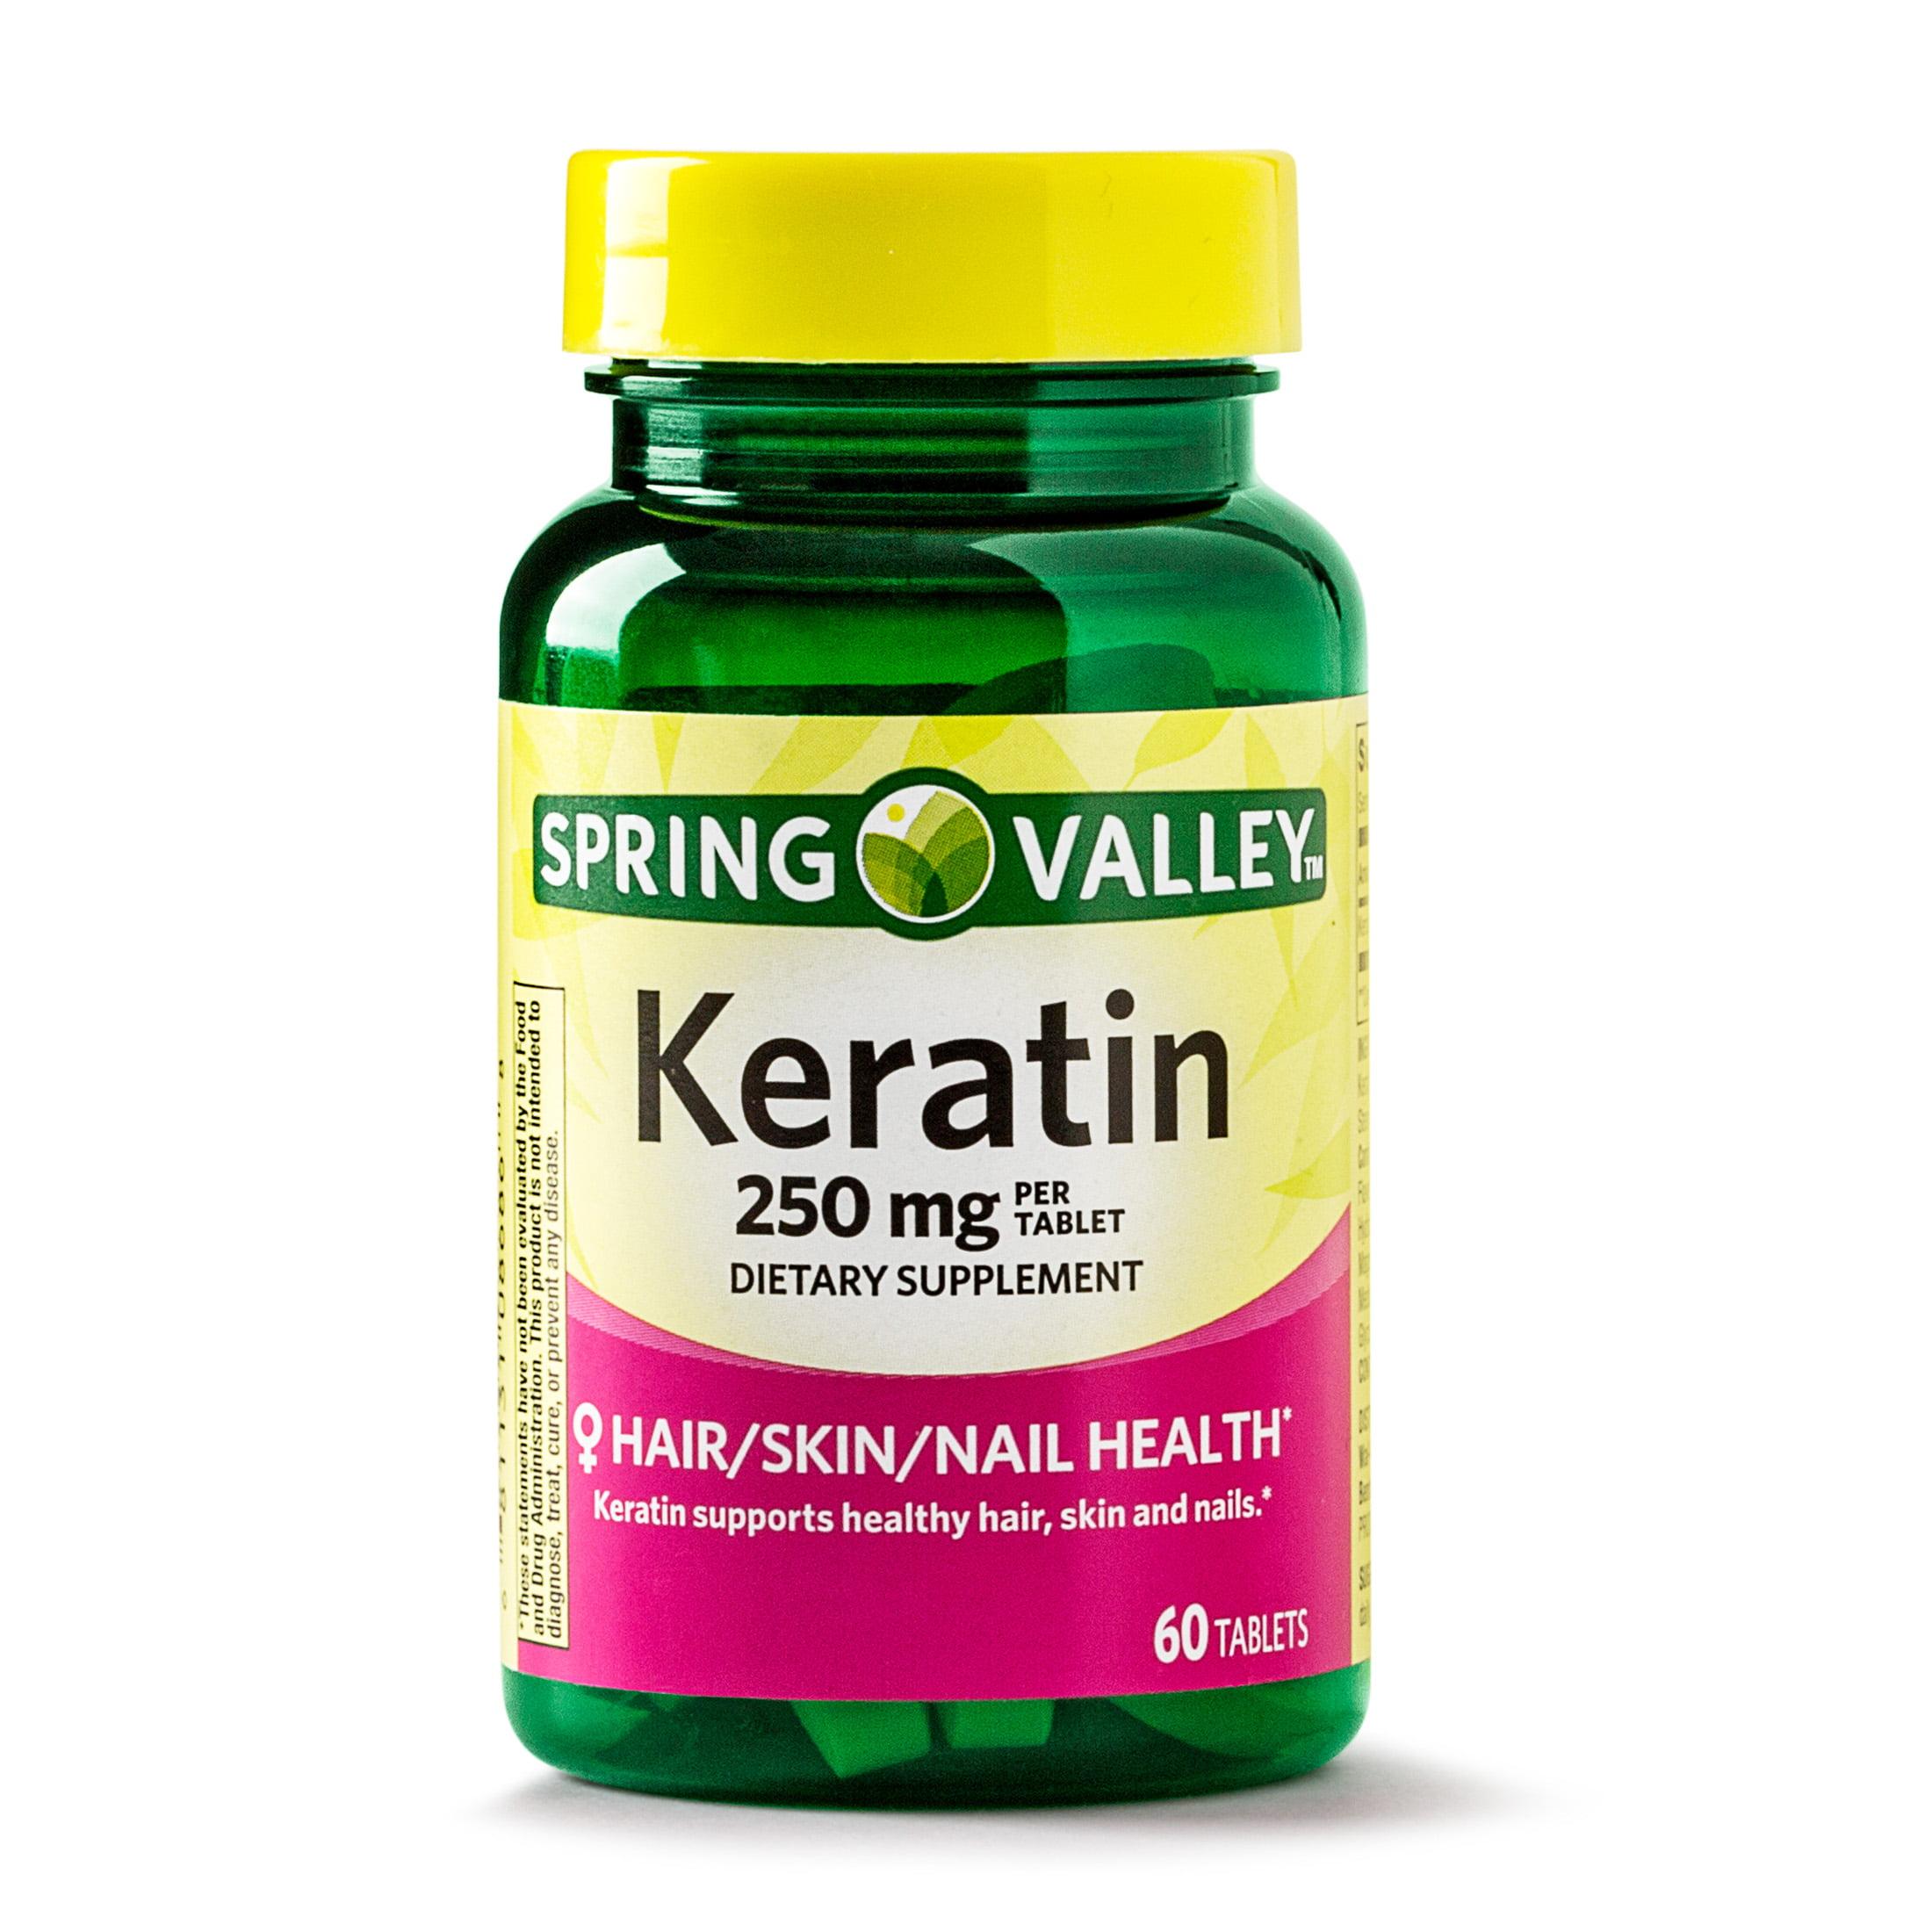 Spring Valley Keratin Tablets, 250 mg, 60 Ct